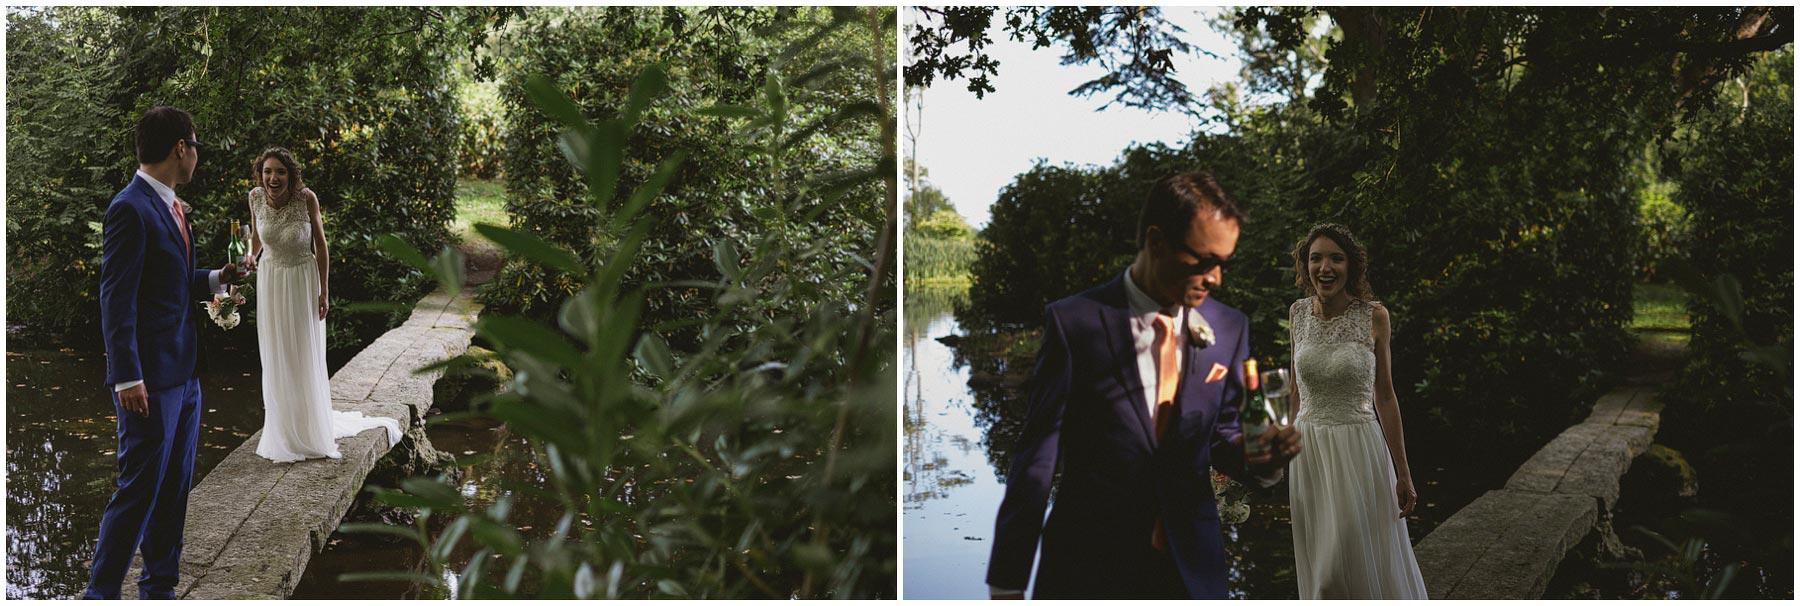 Colehayes-Park-Wedding-Photography_0134